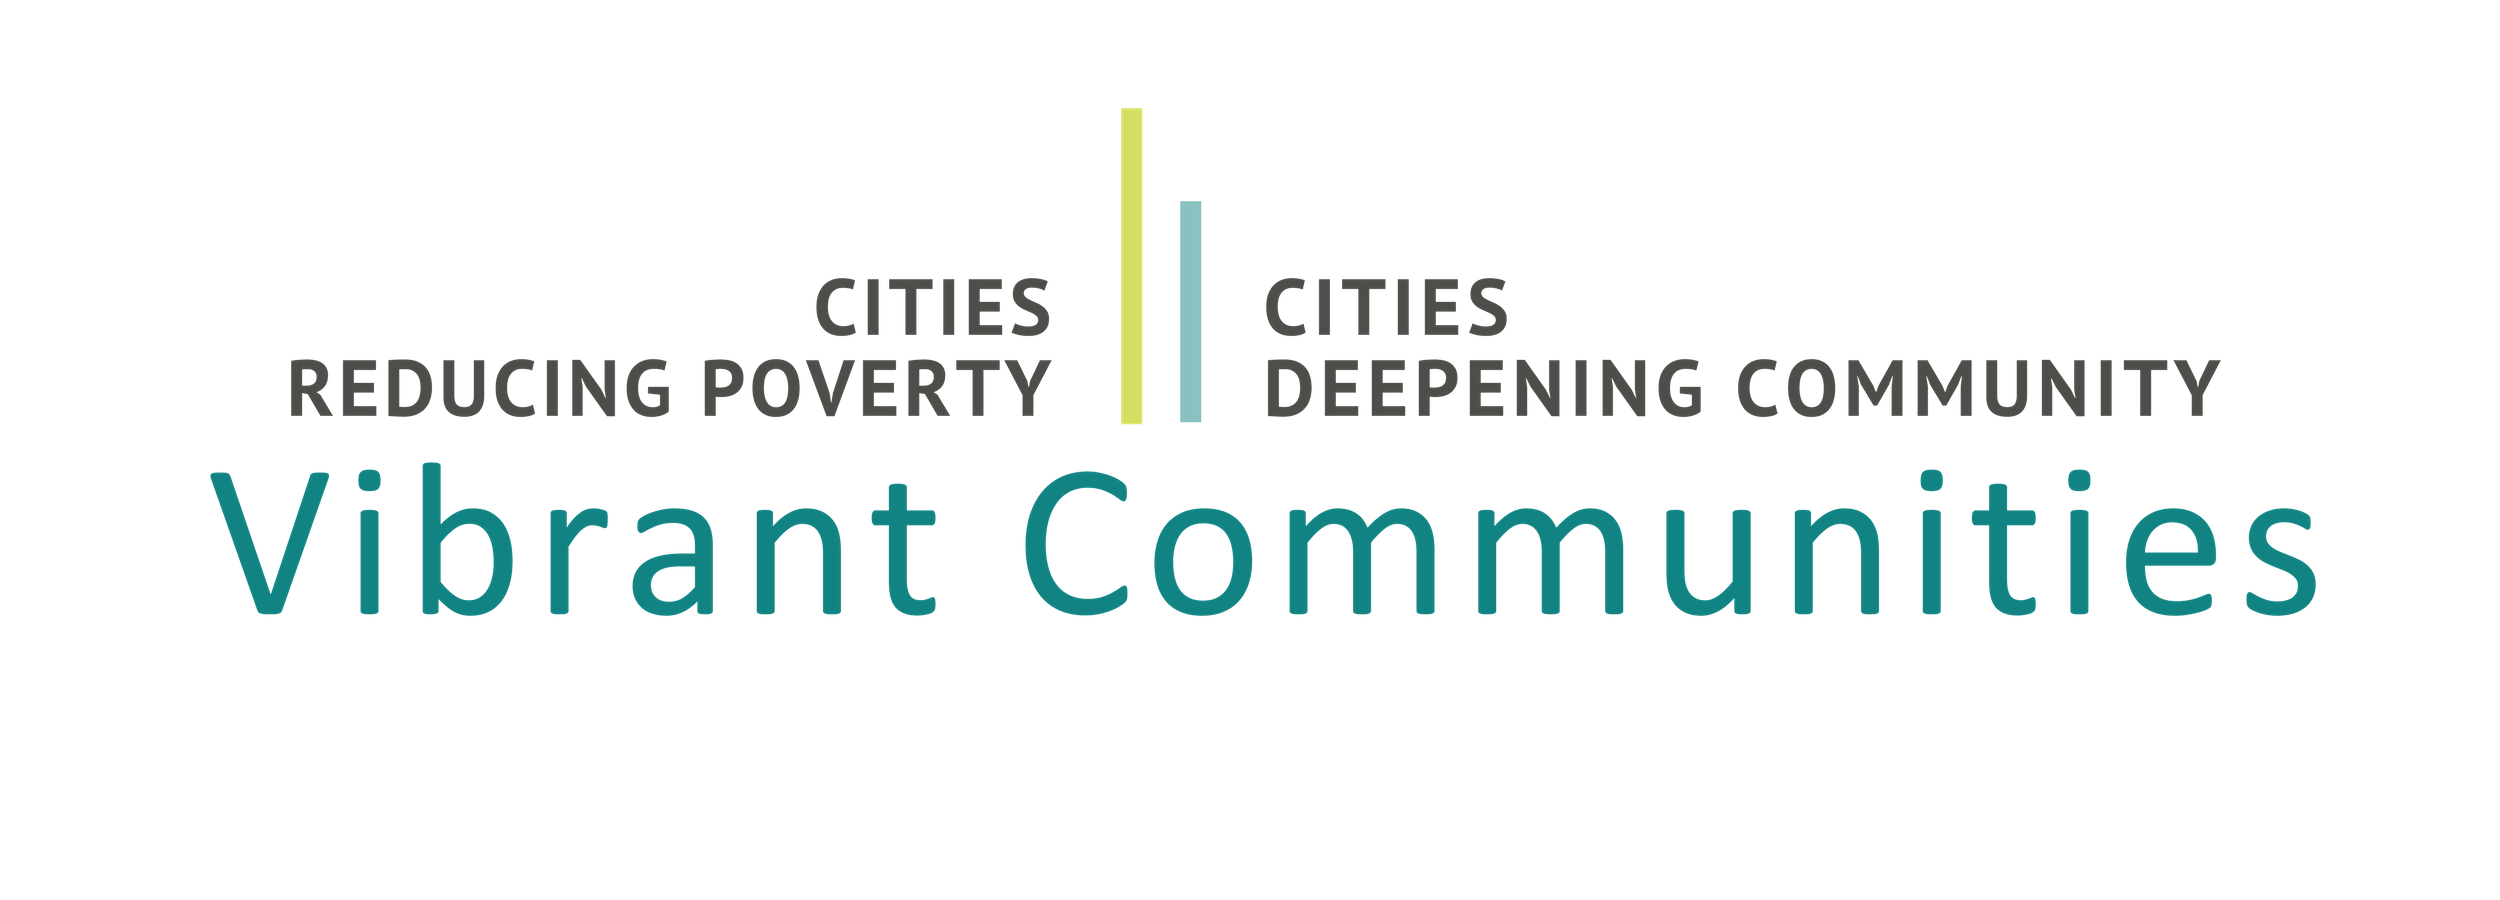 Vibrant Communities Logo.png